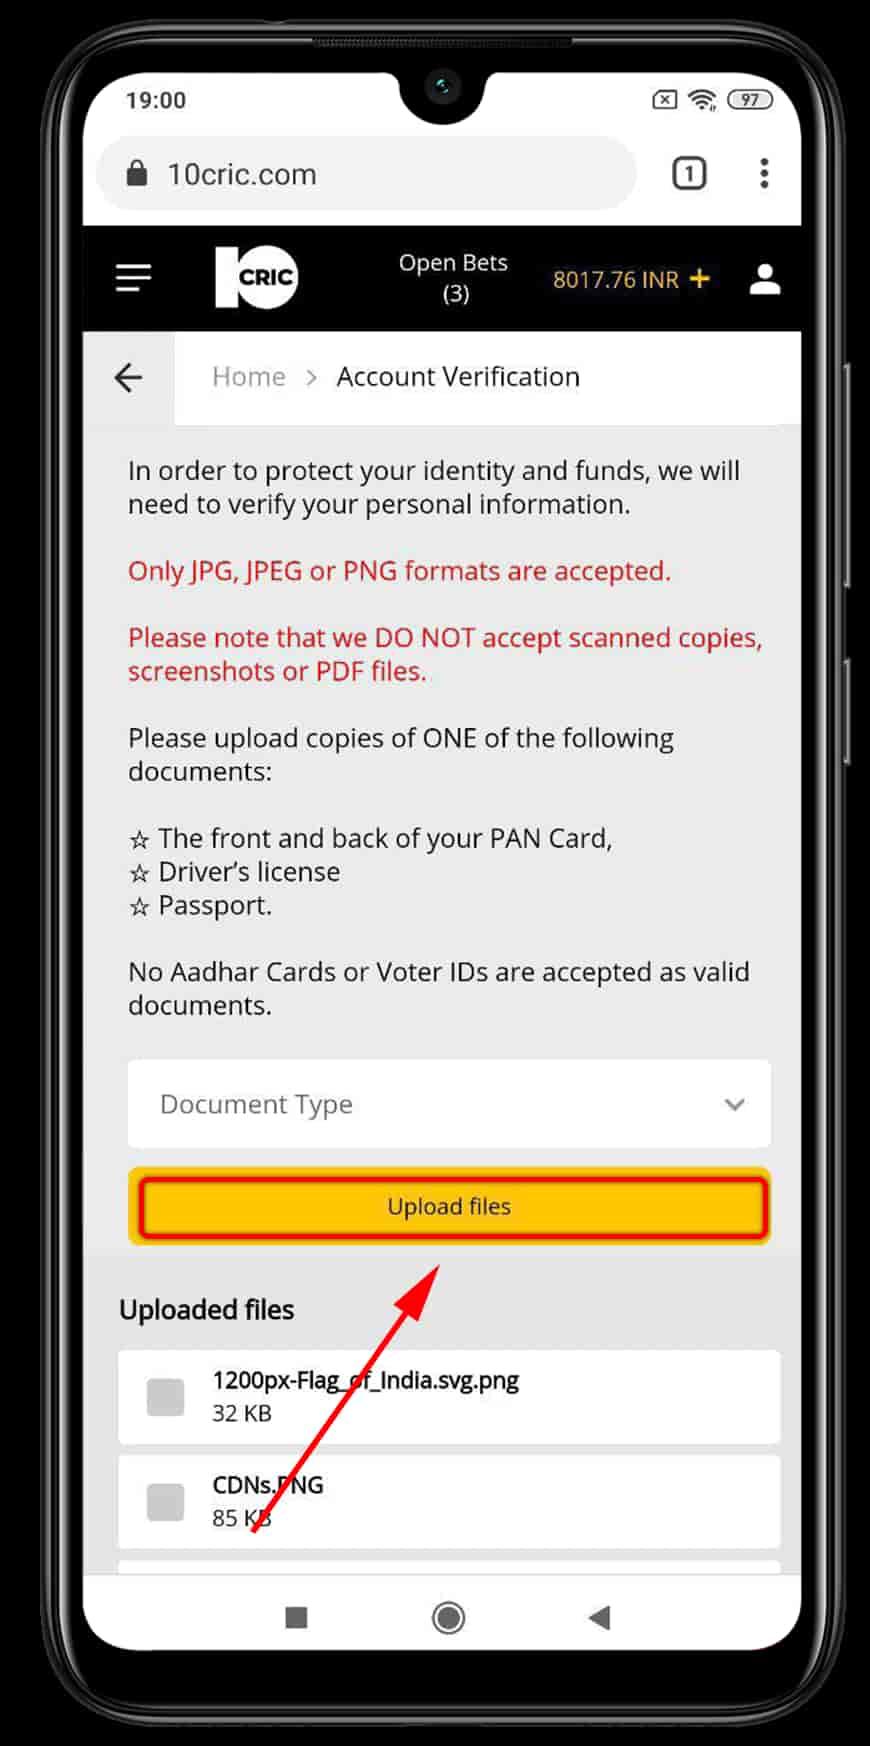 10cric step 3 verification